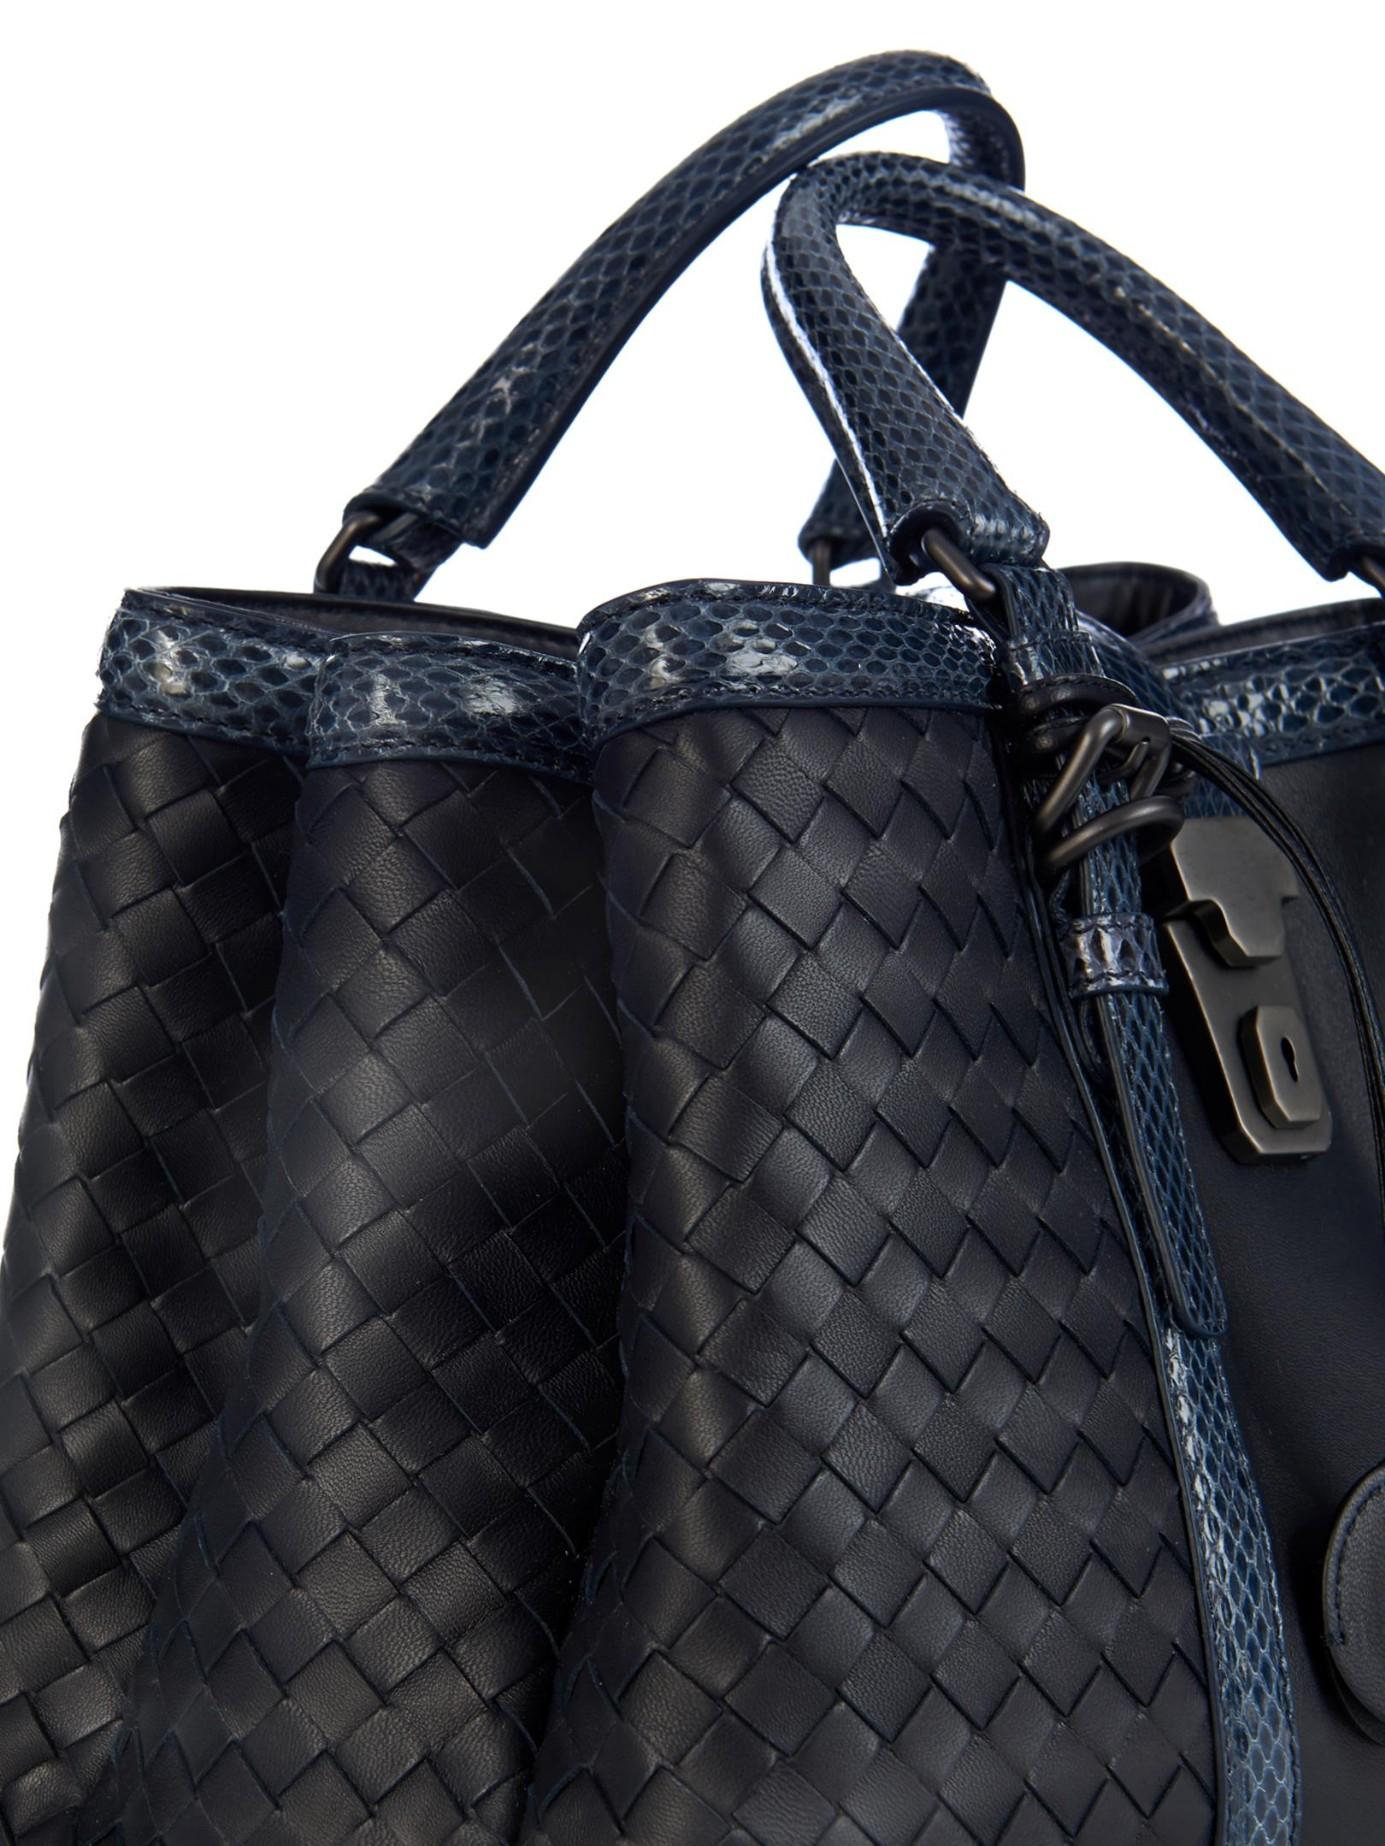 Bottega Veneta Roma Large Intrecciato Leather Tote